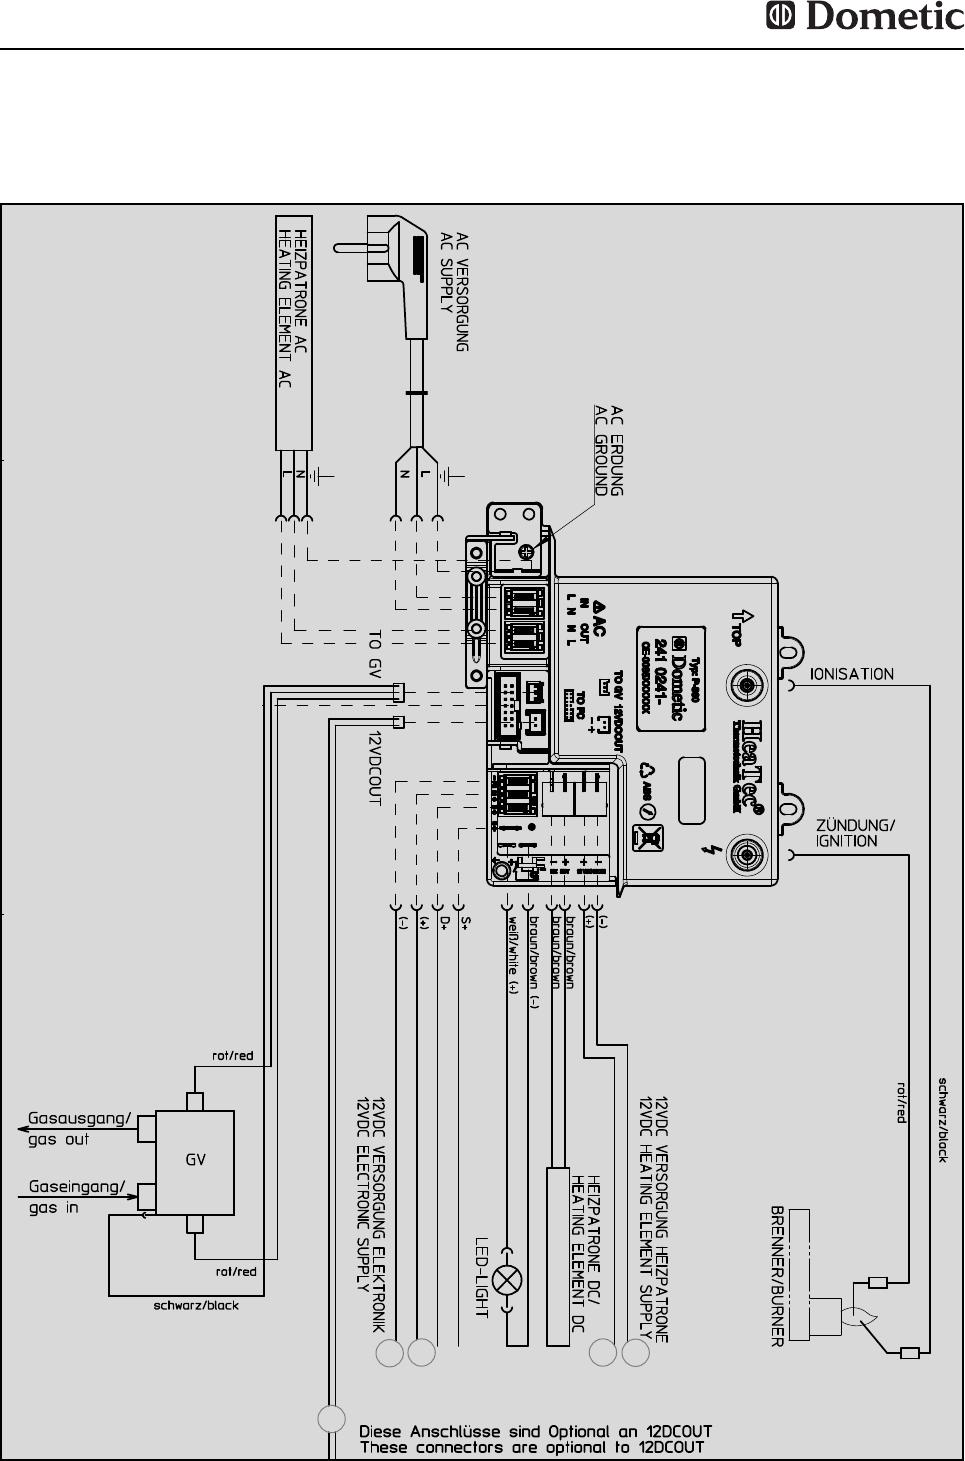 Beste Kühlschrank Schaltplan Galerie - Verdrahtungsideen - korsmi.info